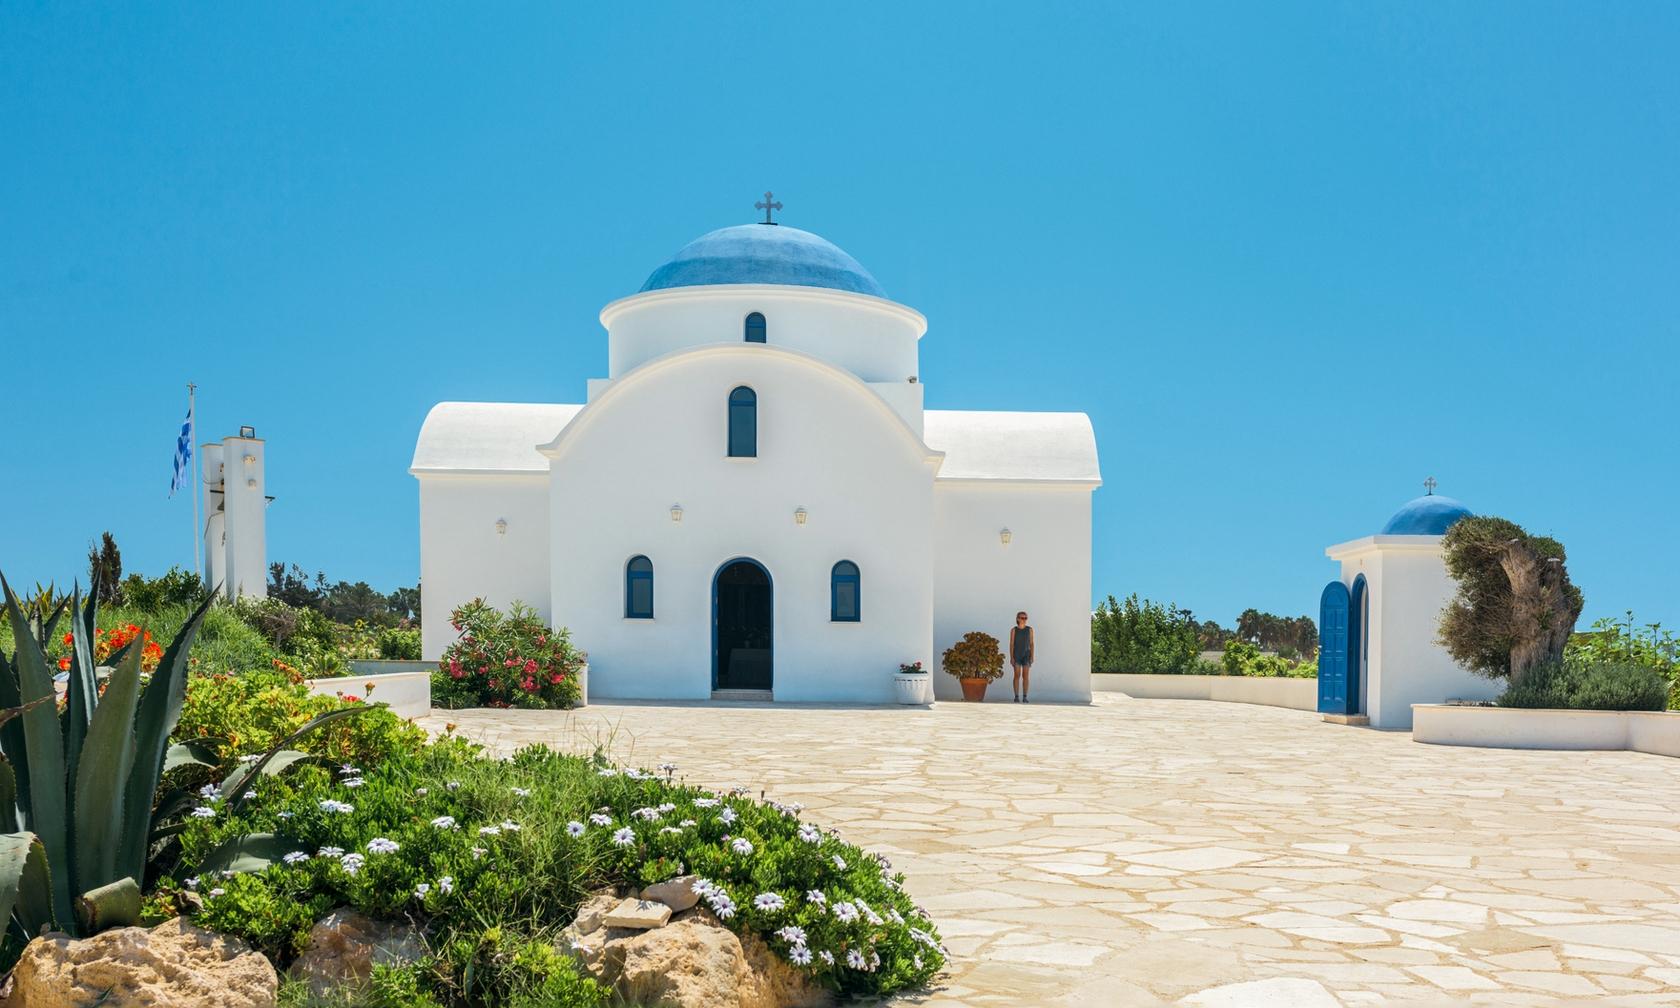 Holiday rentals in Protaras